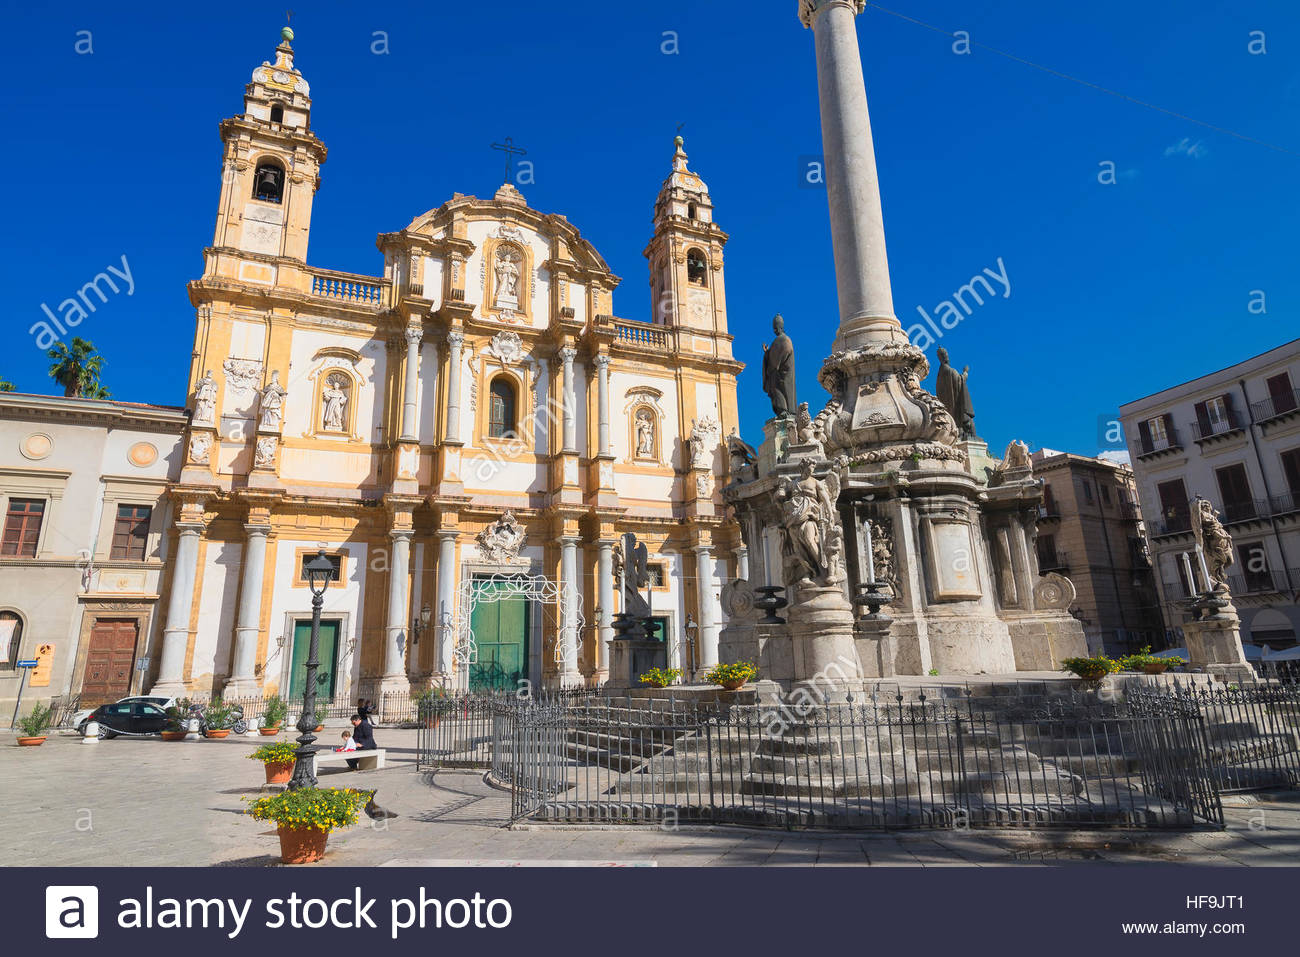 Church of San Domenico, Palermo, Sicily, Italy, Europe, - Stock Image